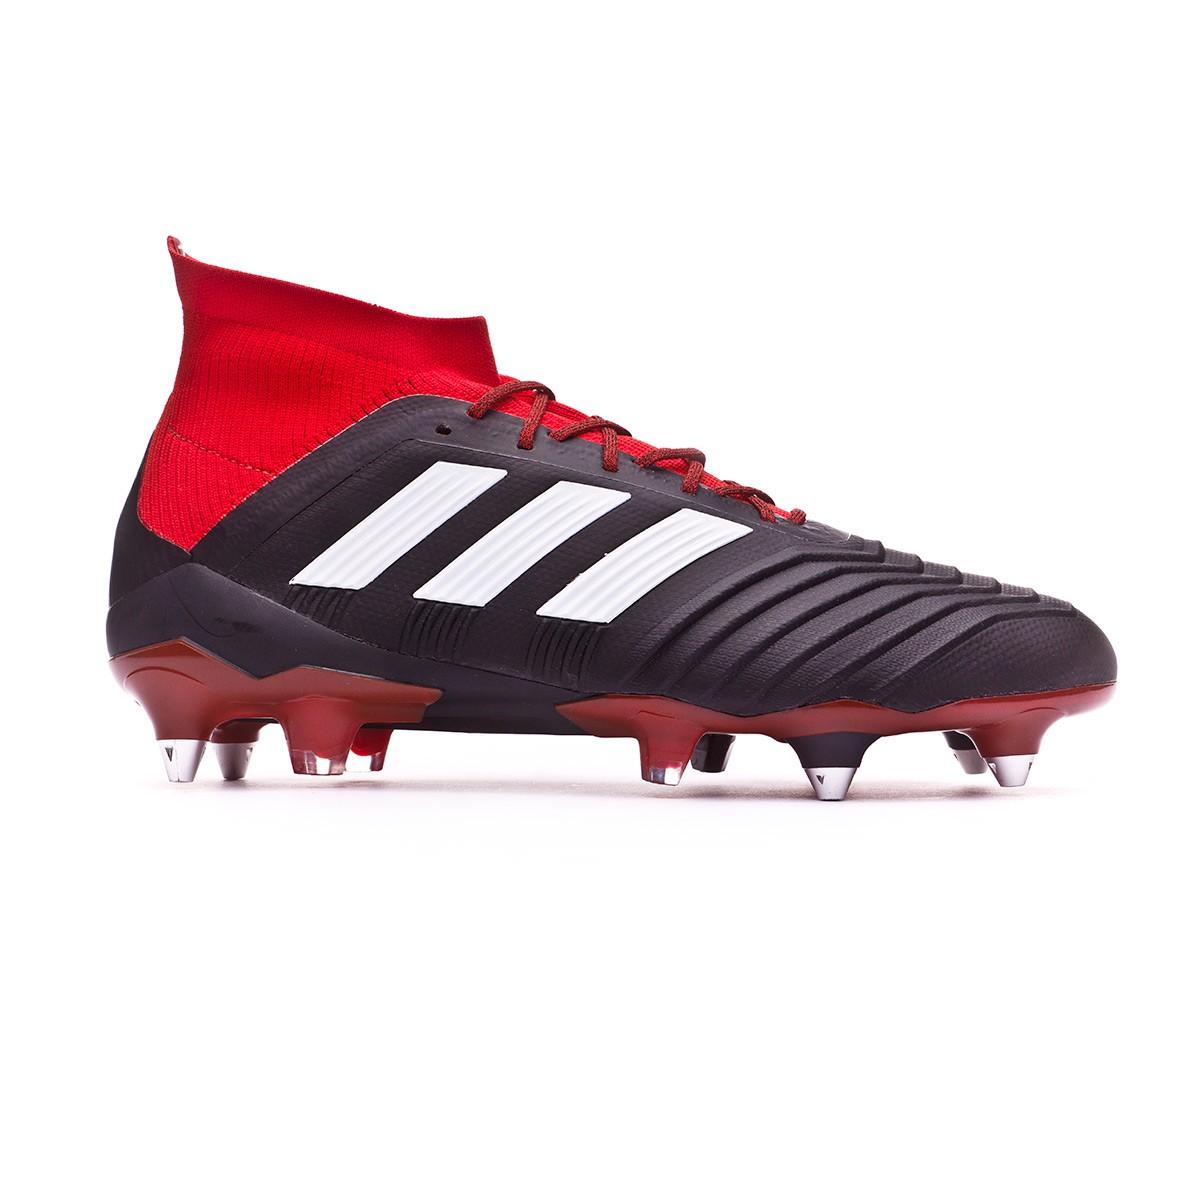 Football Boots adidas Predator 18.1 SG